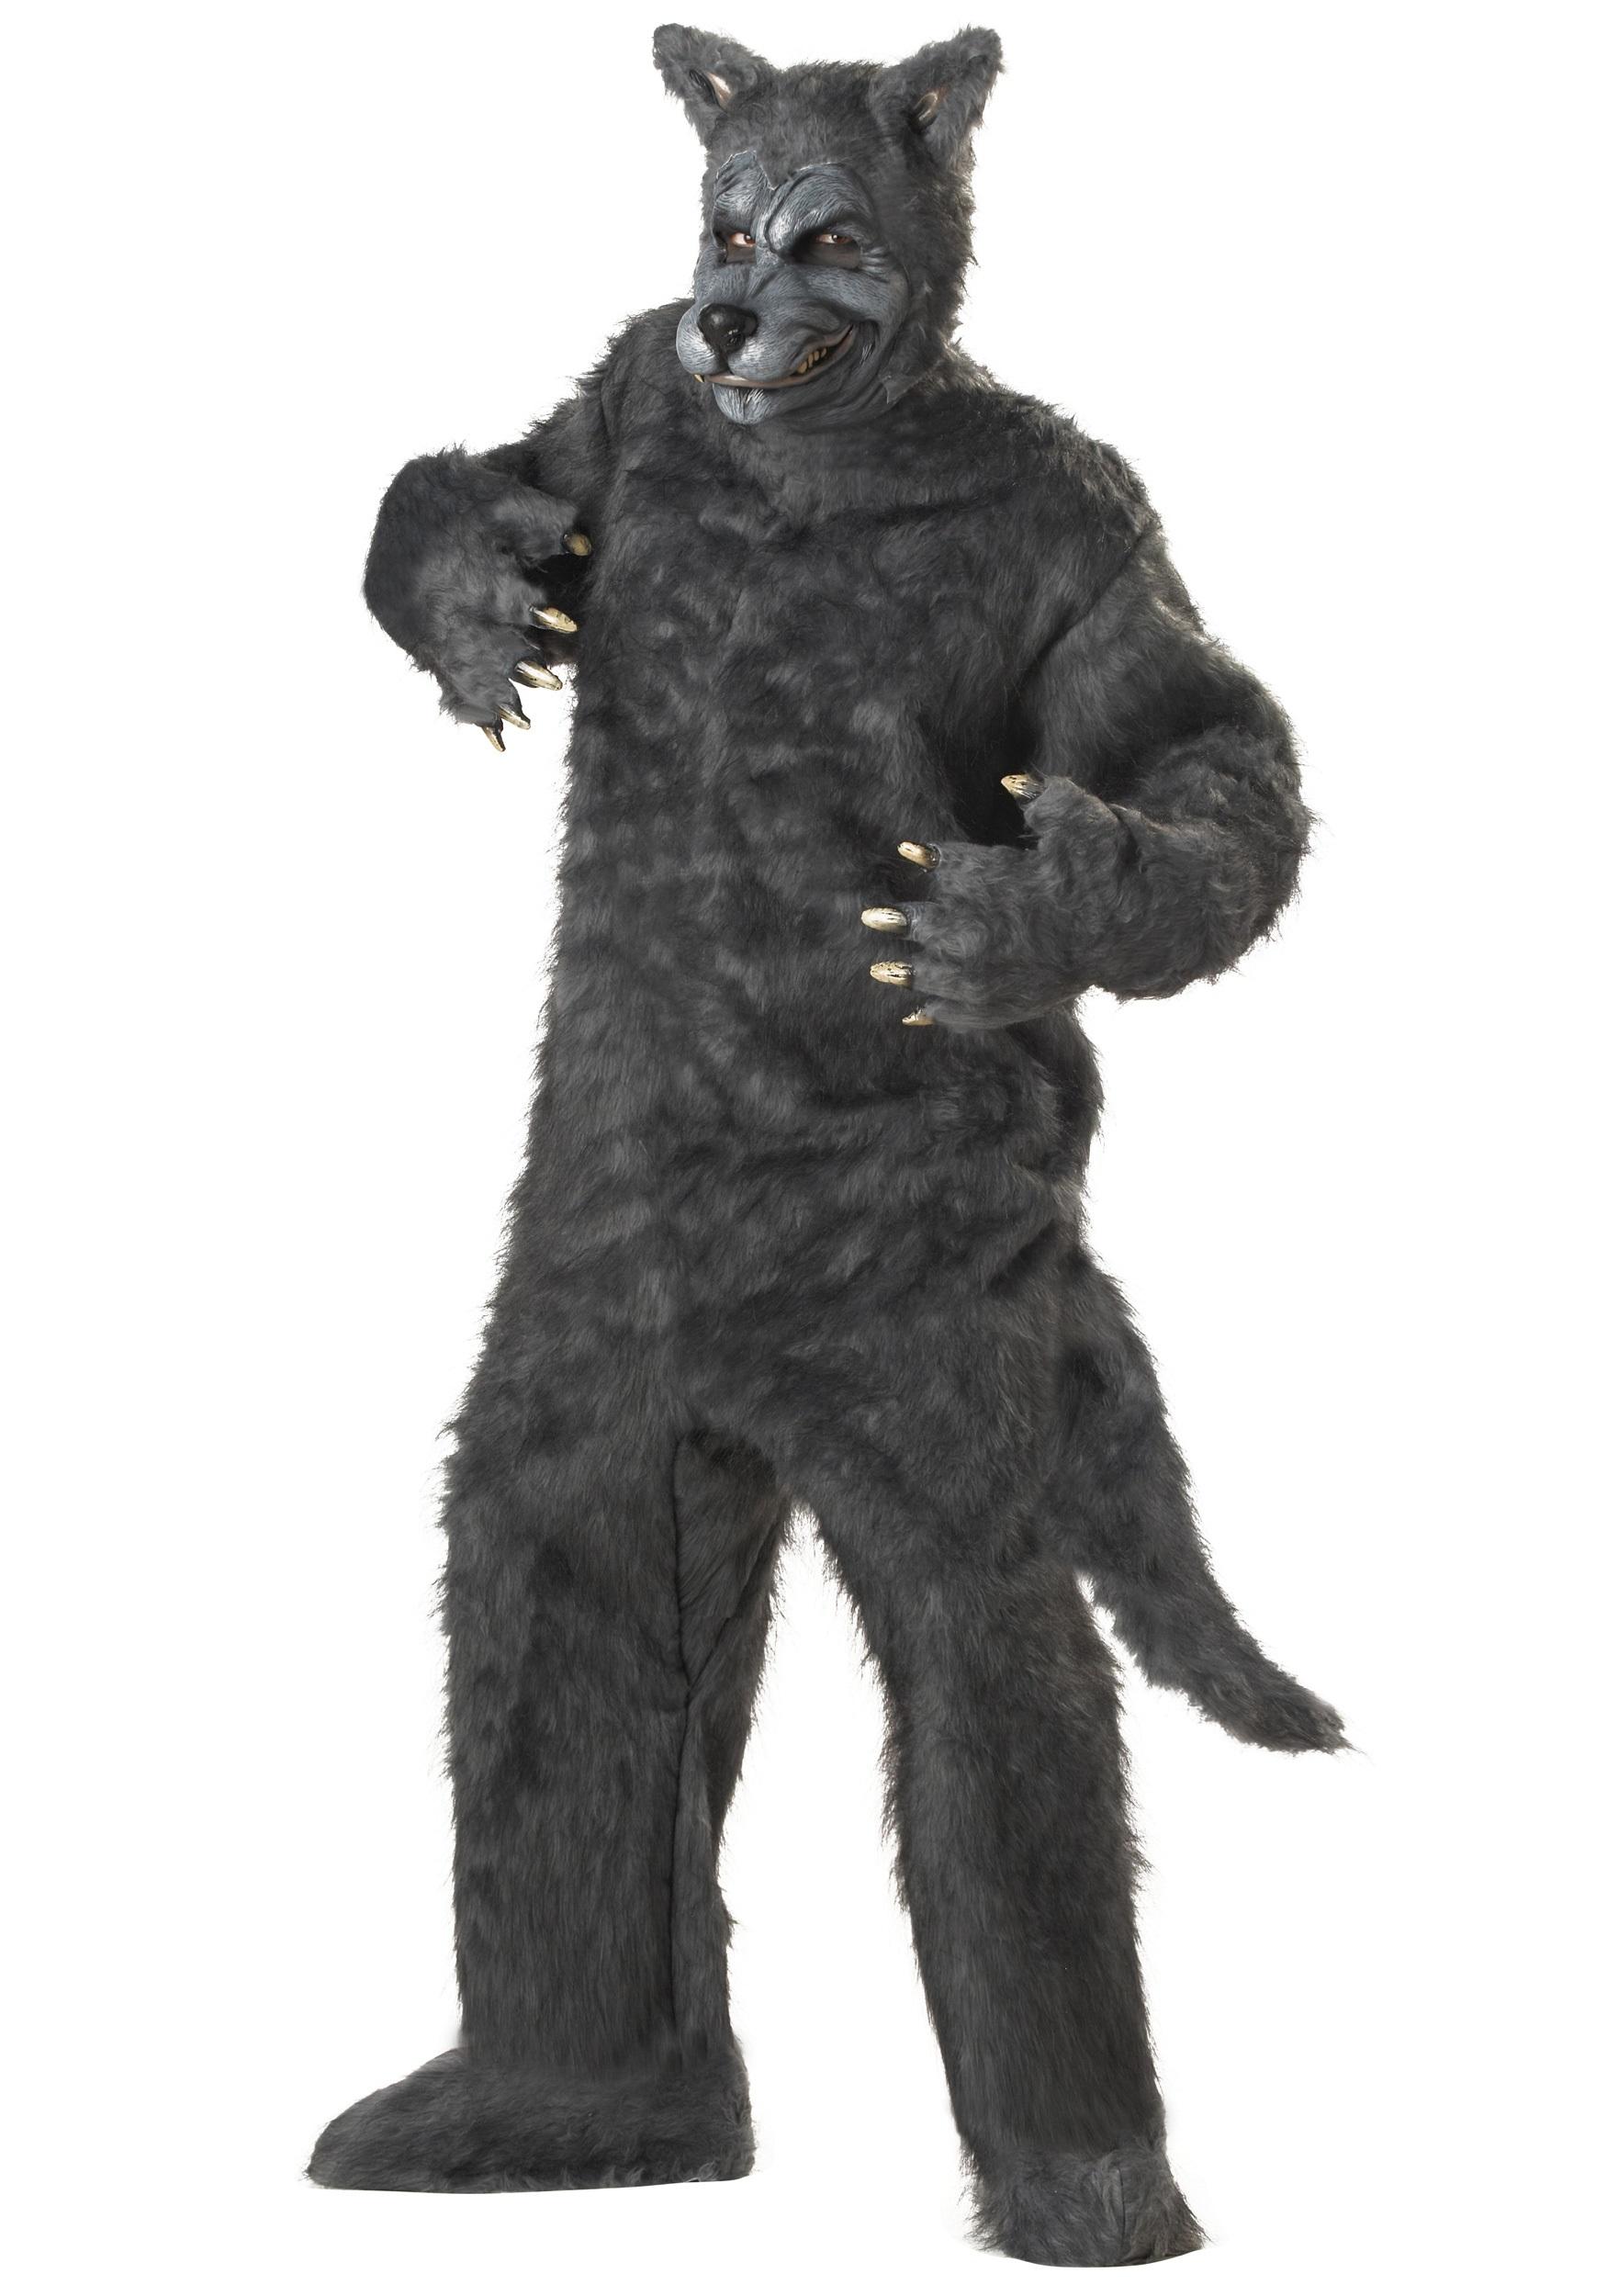 Big Bad Wolf Costume | Storybook Character Costume